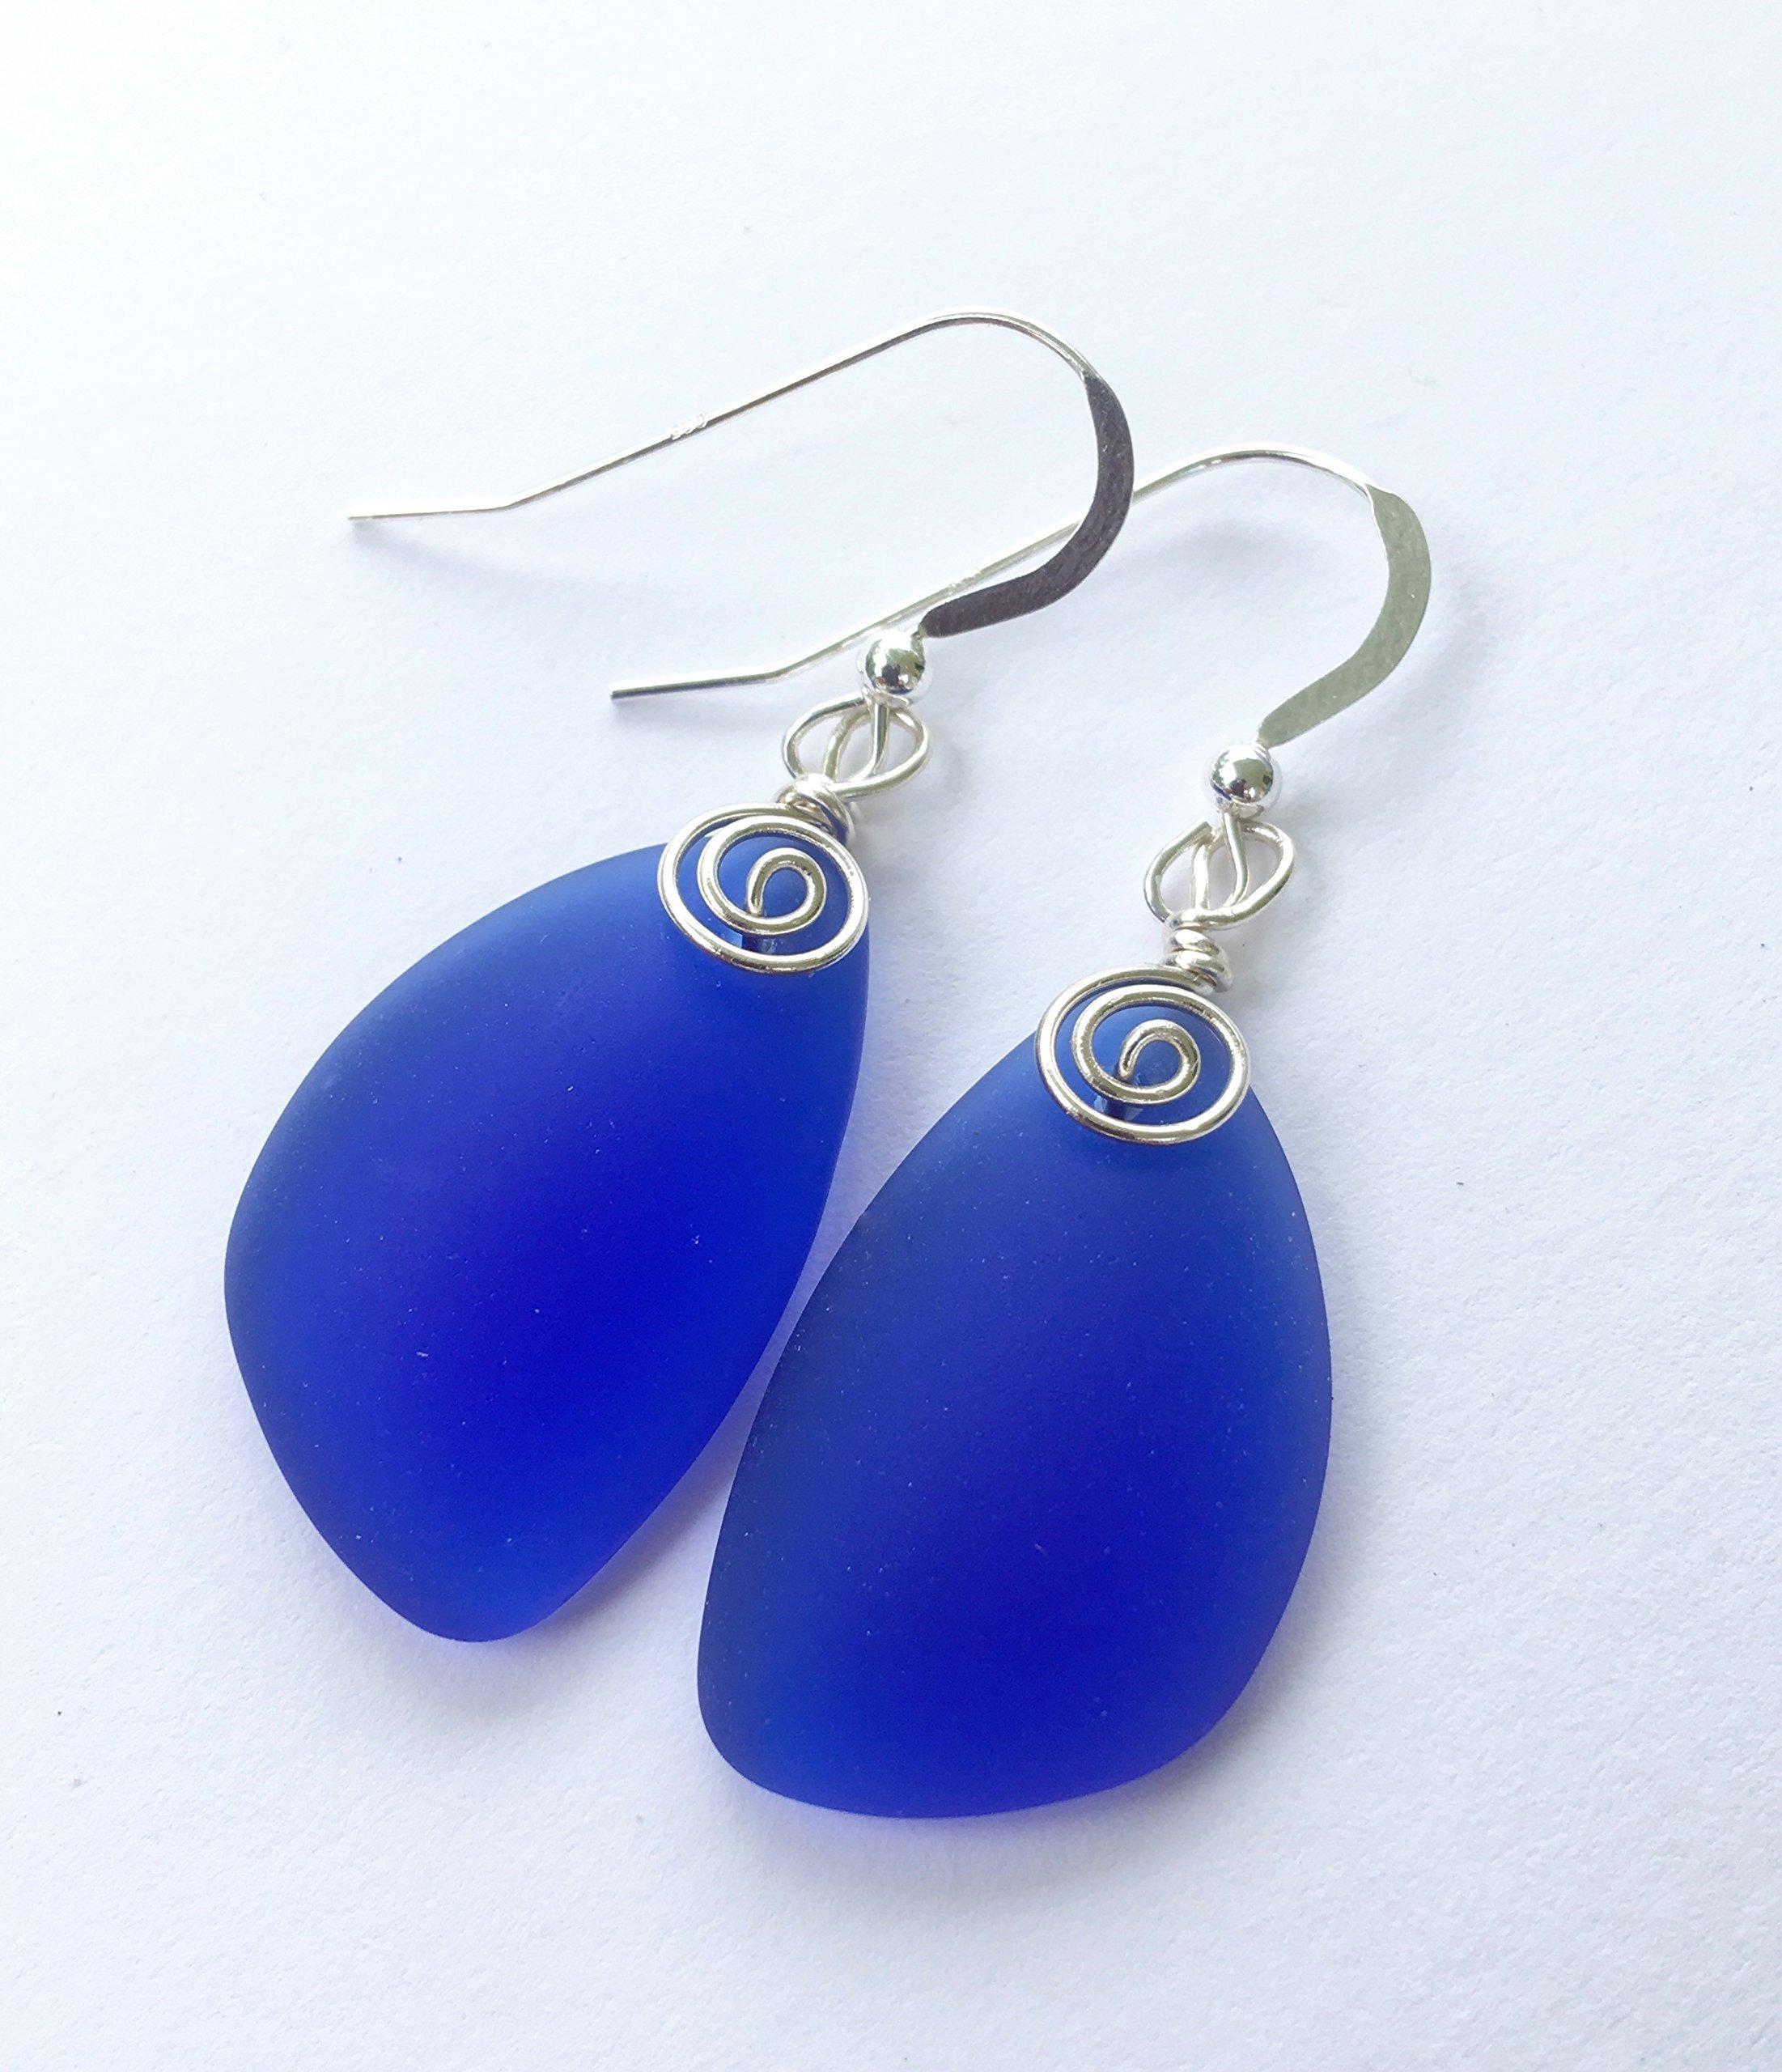 Number One Selling Cobalt Blue Swirl Sterling Silver Earrings, Sea Glass Earrings, Cobalt Blue Earrings, Gift for her, Dangle Earrings, Sterling Silver Earrings, July 4th Jewelry